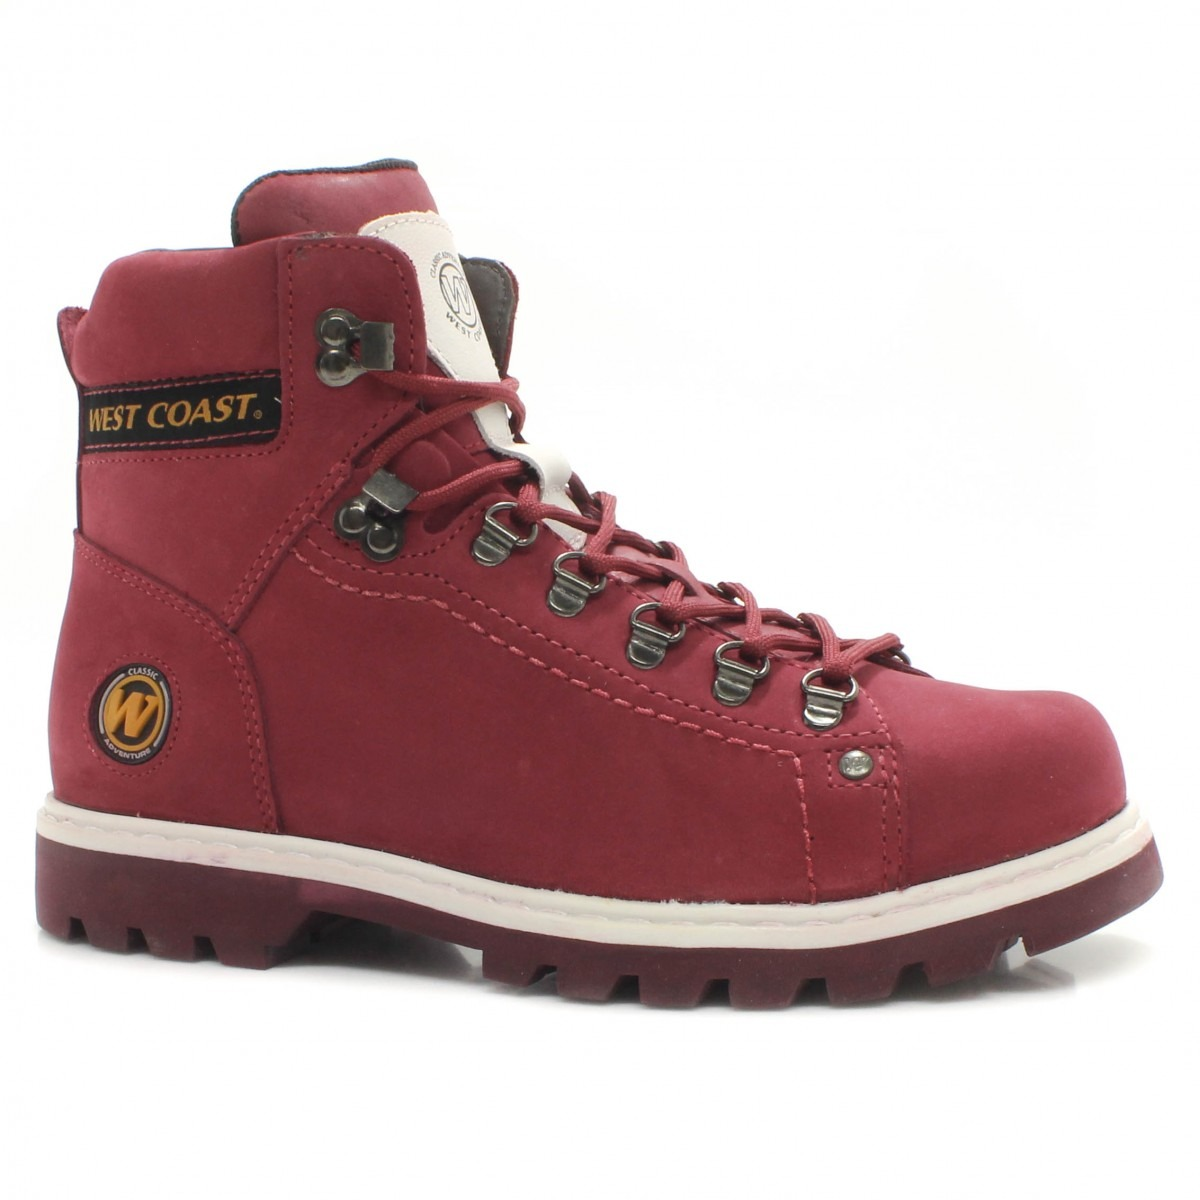 a55d40ef19 Bota Coturno West Coast Worker Sneaker 122101